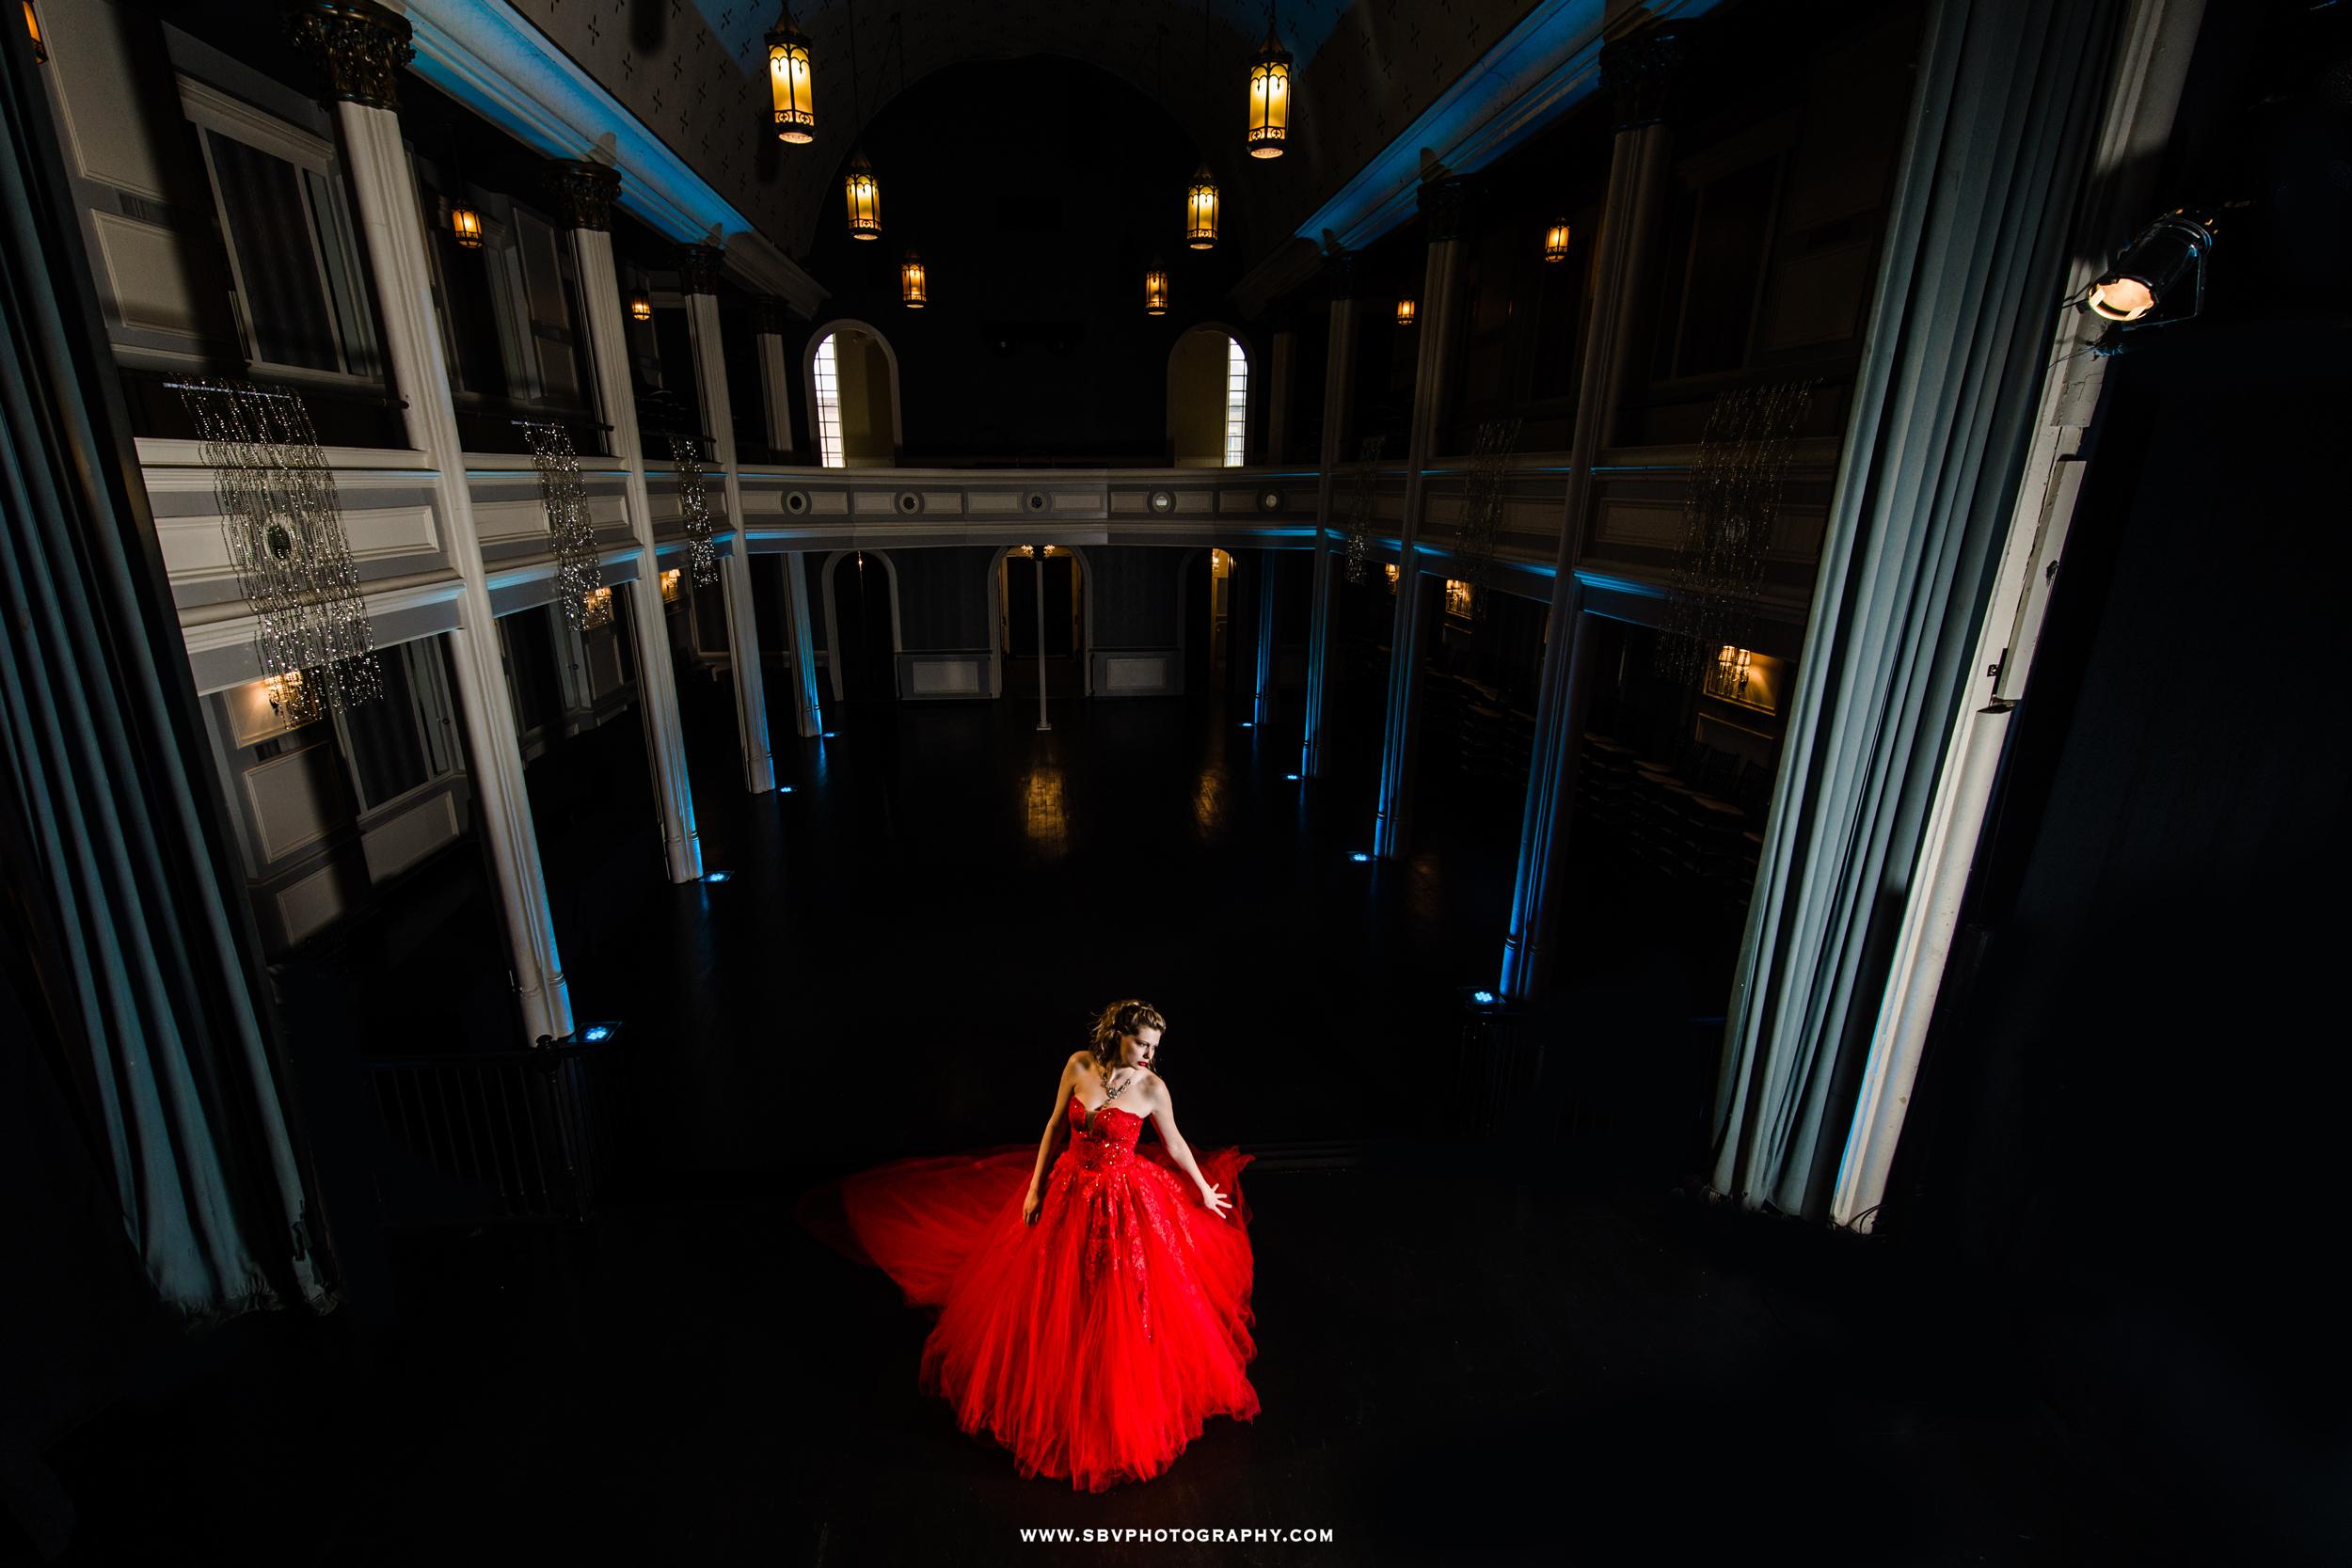 Fashion inspired ballroom dress photo shoot.